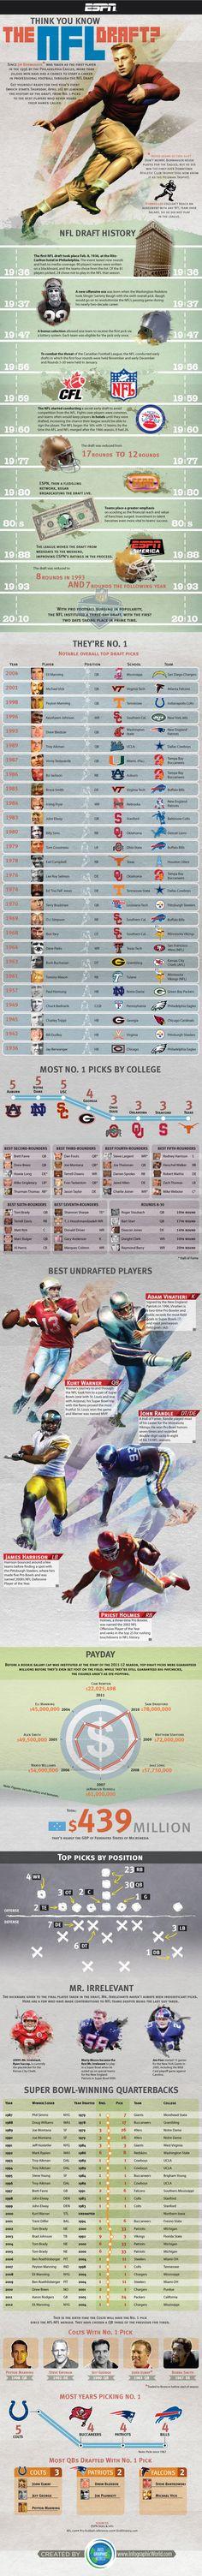 ESPN Infographic: NFL Draft